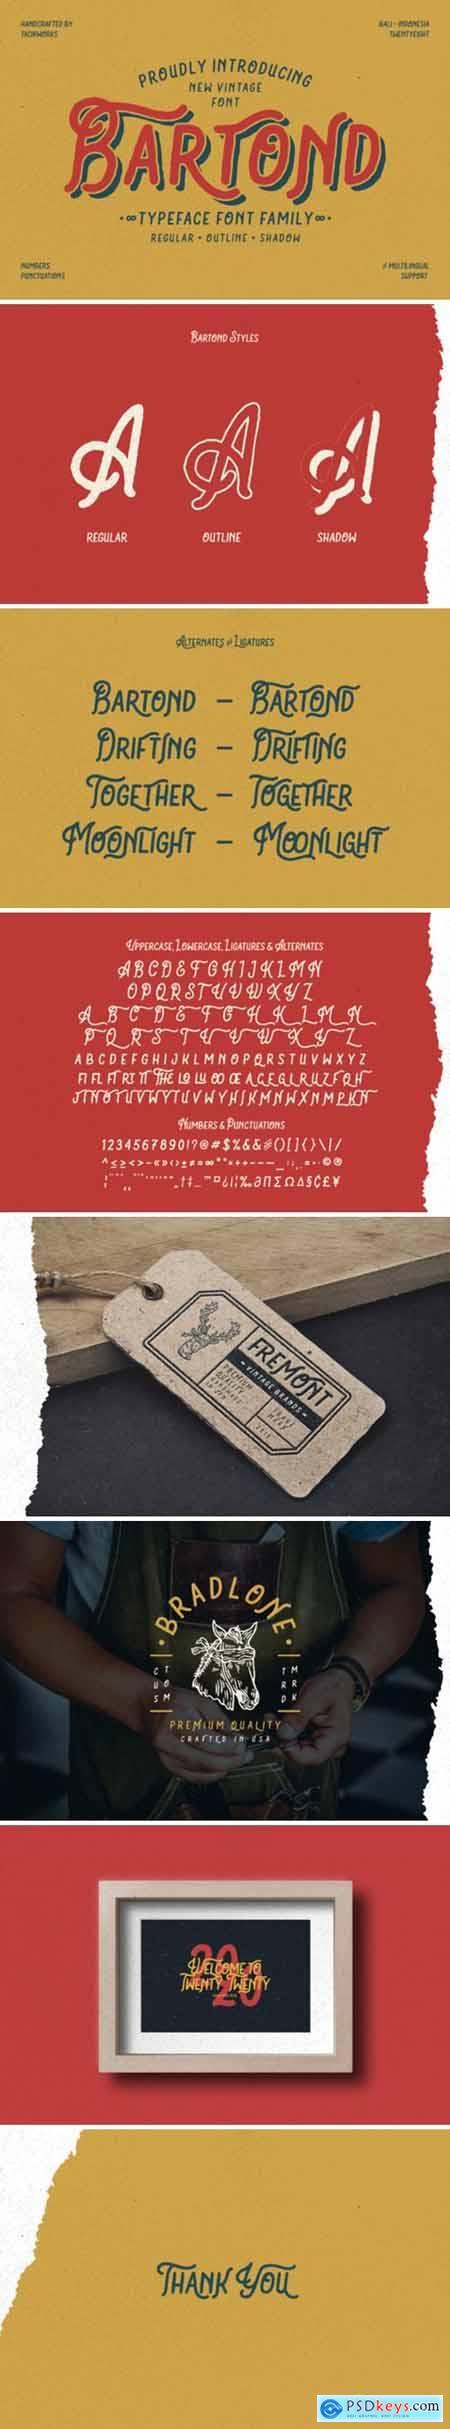 Bartond Typeface 4428876